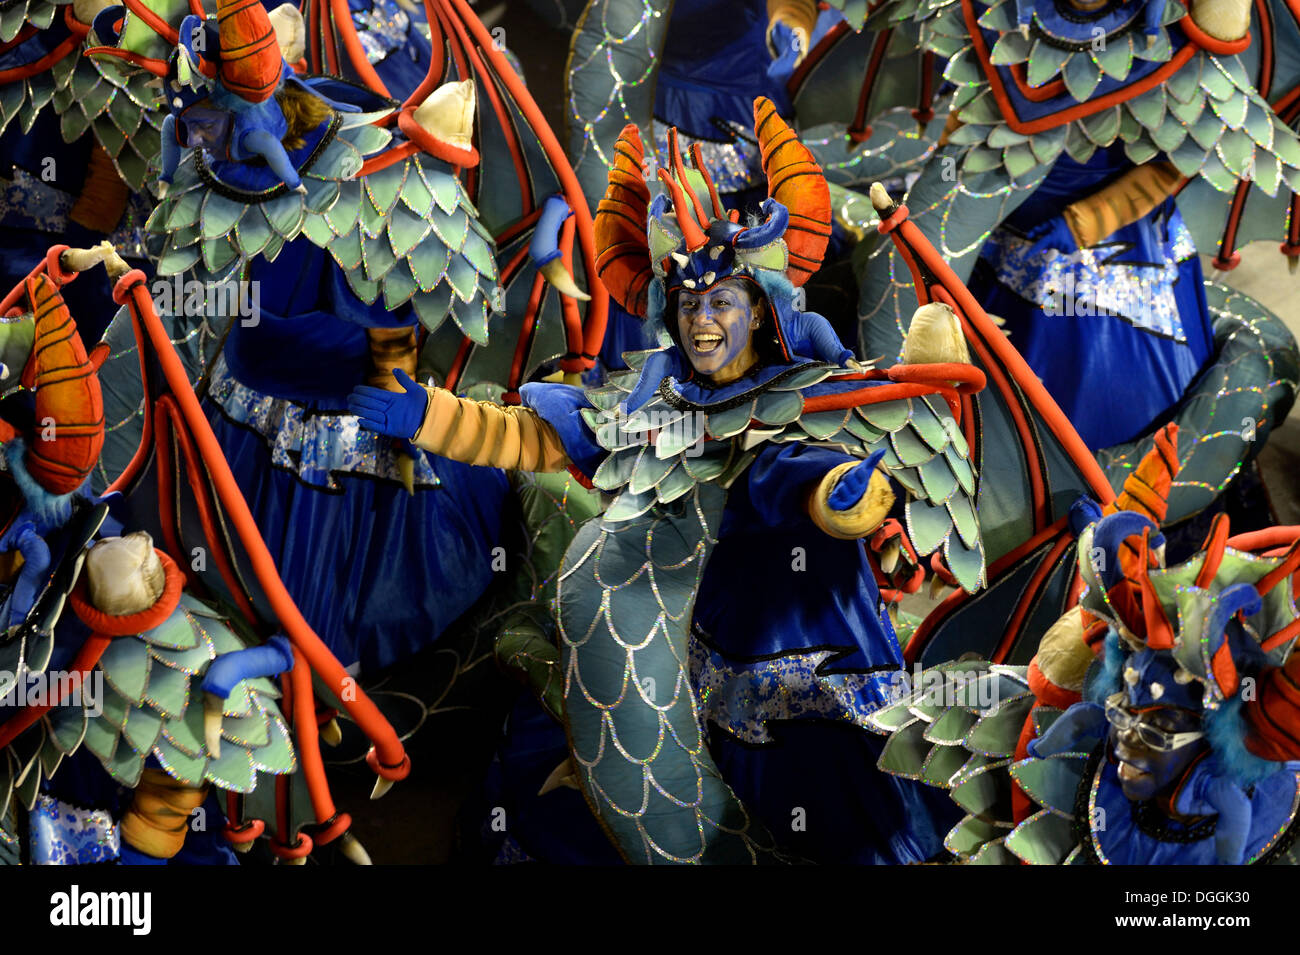 Samba dancers dressed in fanciful costumes, parade of the samba school Unidos da Tijuca, themed 'Enchanted Germany', Sambodromo - Stock Image